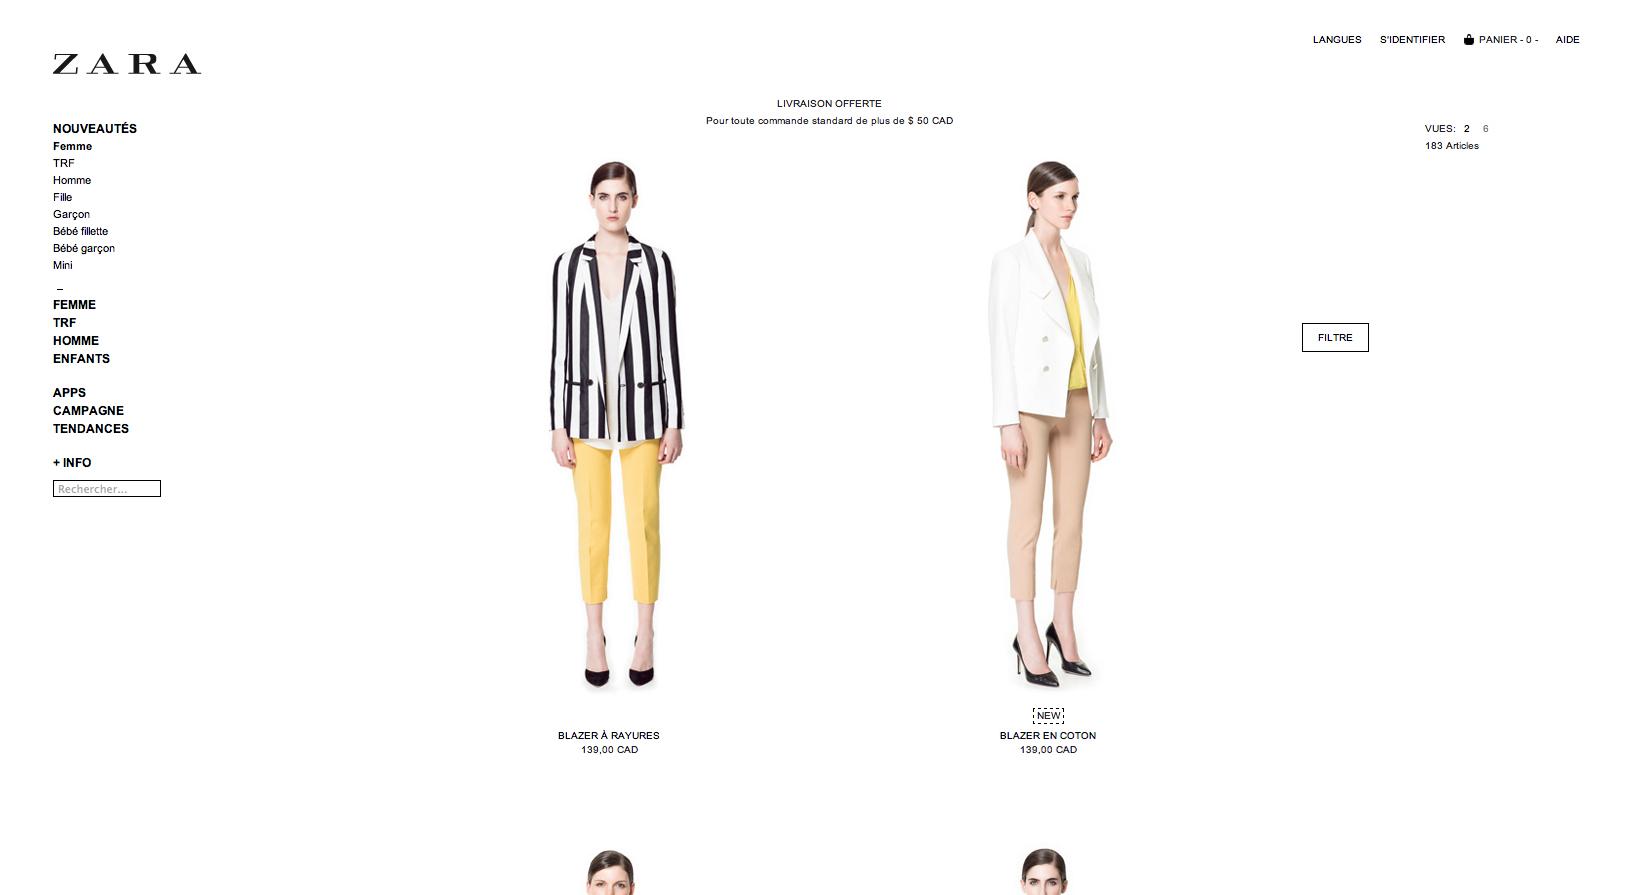 La boutique zara en ligne ch telaine - Zara maison en ligne ...